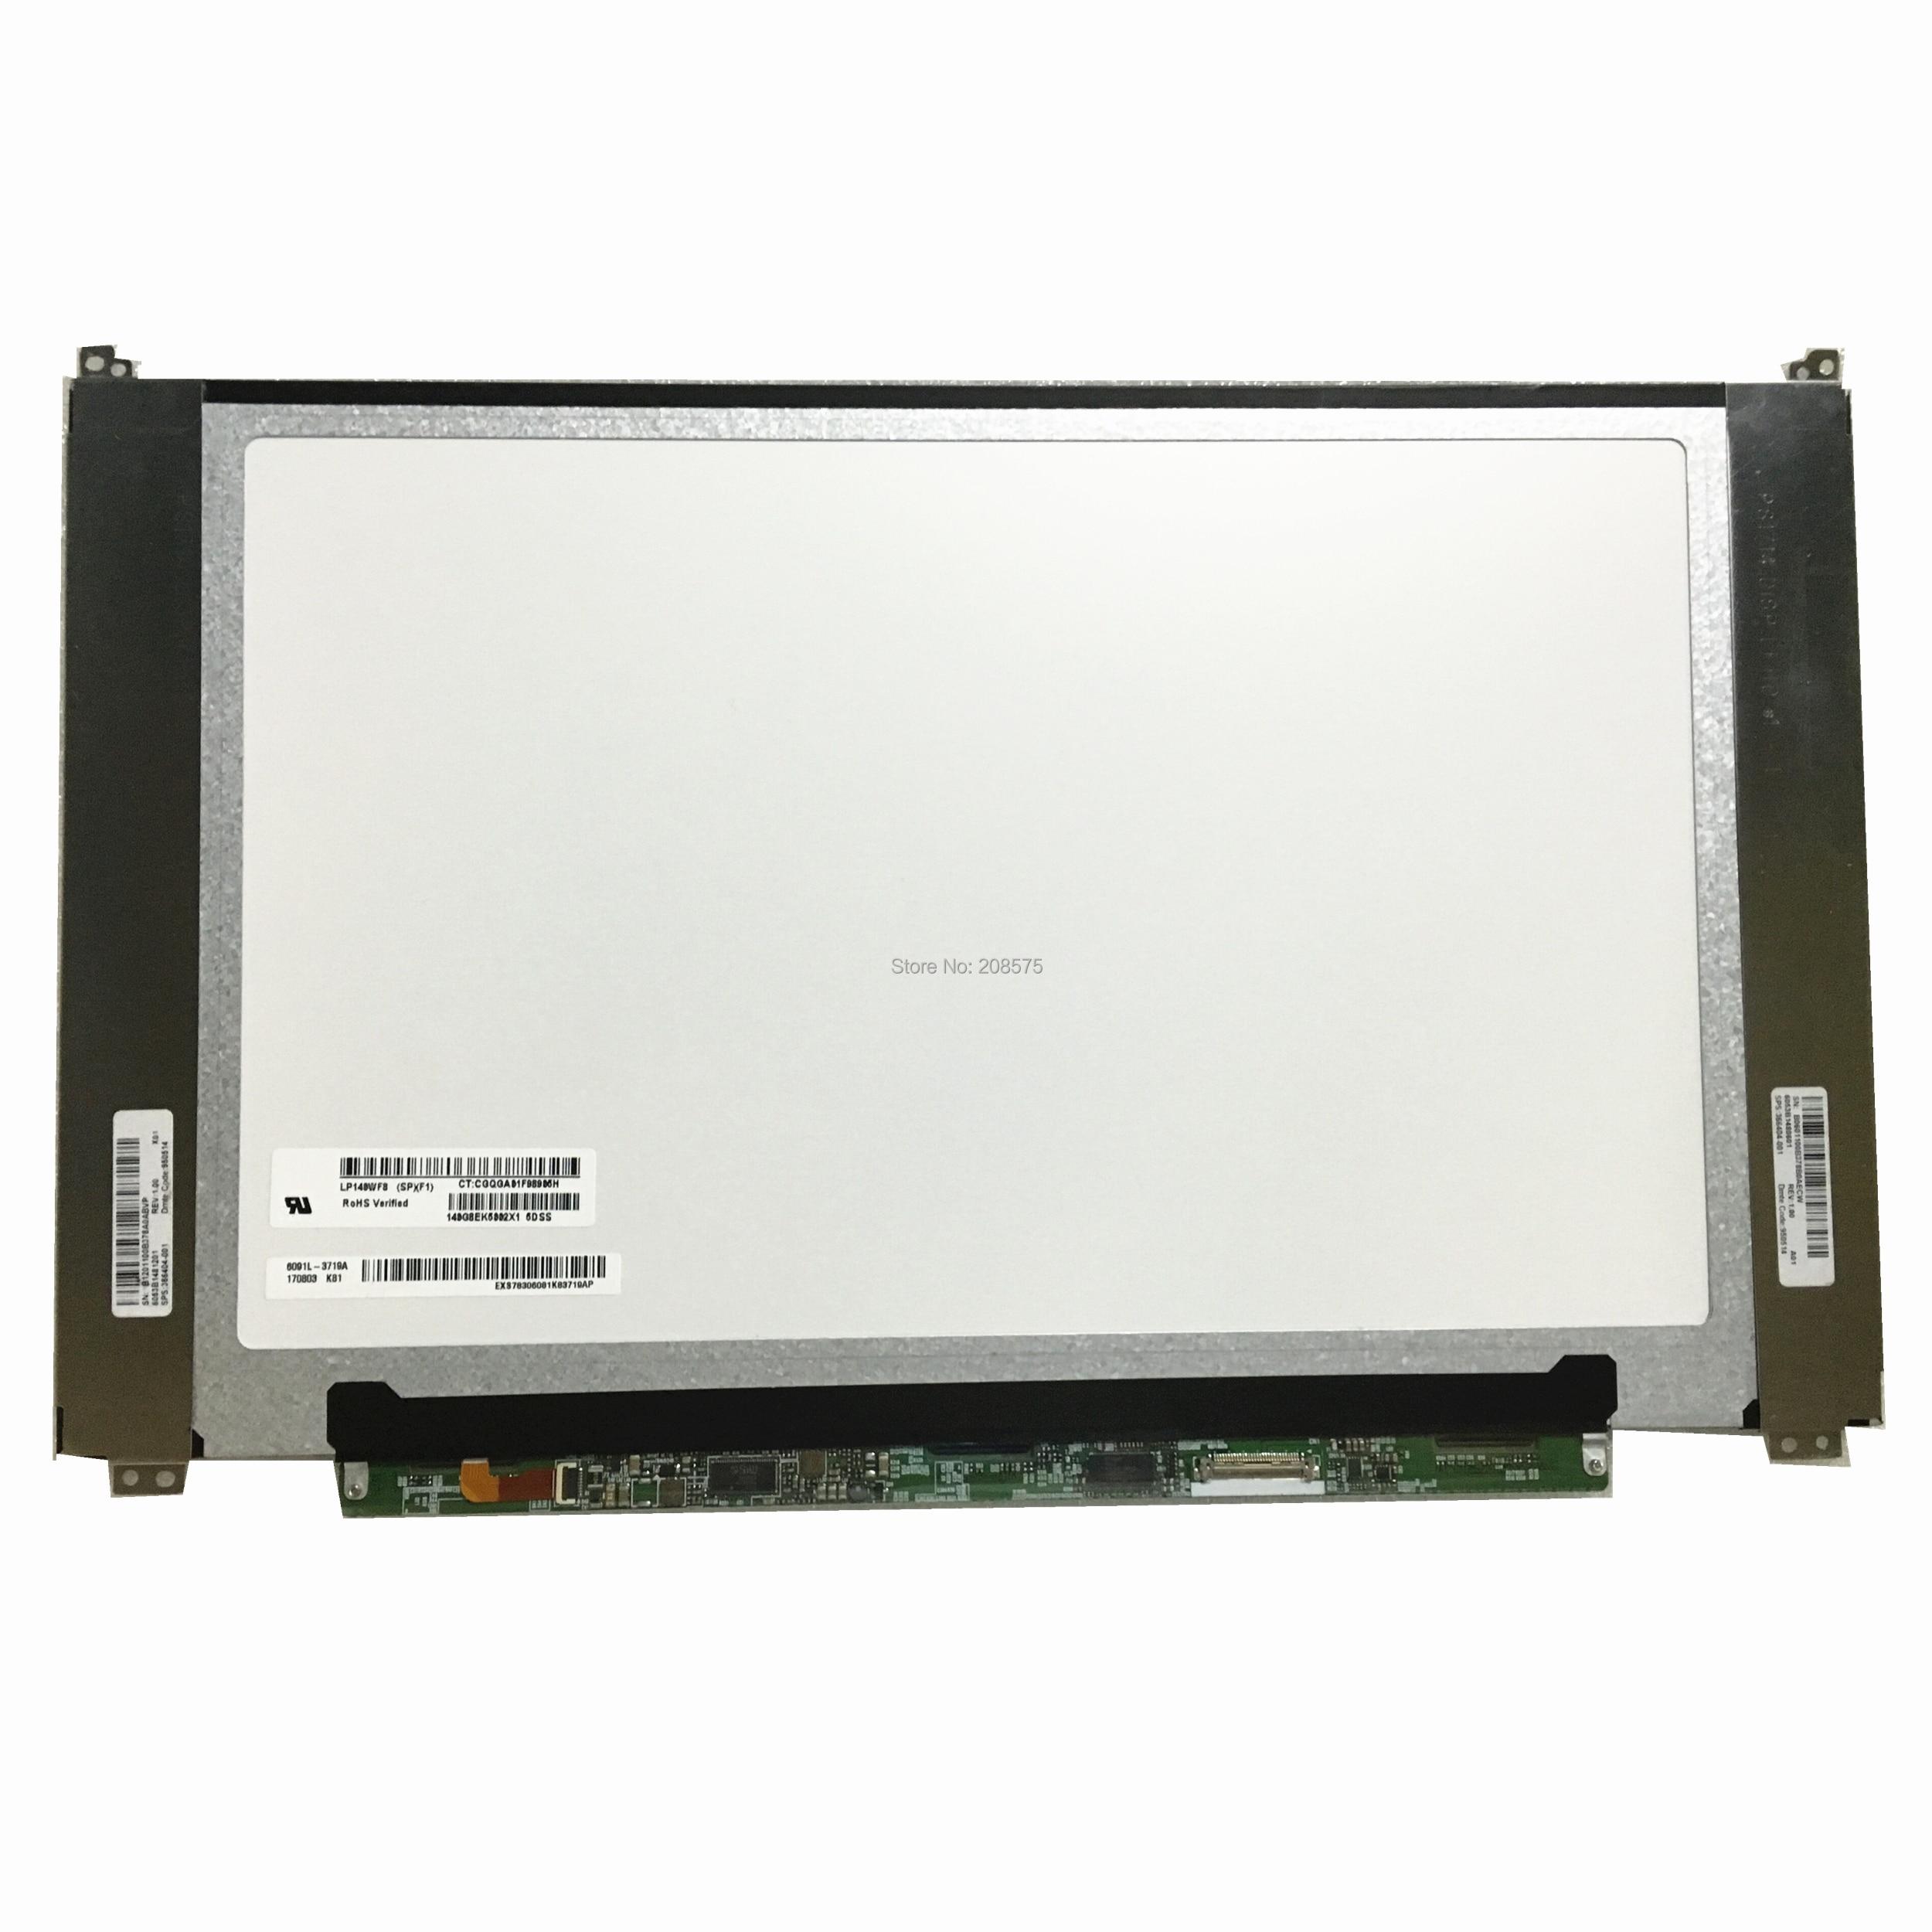 Free shipping LP140WF8-SPF1 LP140WF8 SPF1 LP140WF8-SPQ1 LP140WF8-SPR1 SPR9 SPP1 Laptop Lcd Screen Panel 1920*1080 30 pinsFree shipping LP140WF8-SPF1 LP140WF8 SPF1 LP140WF8-SPQ1 LP140WF8-SPR1 SPR9 SPP1 Laptop Lcd Screen Panel 1920*1080 30 pins